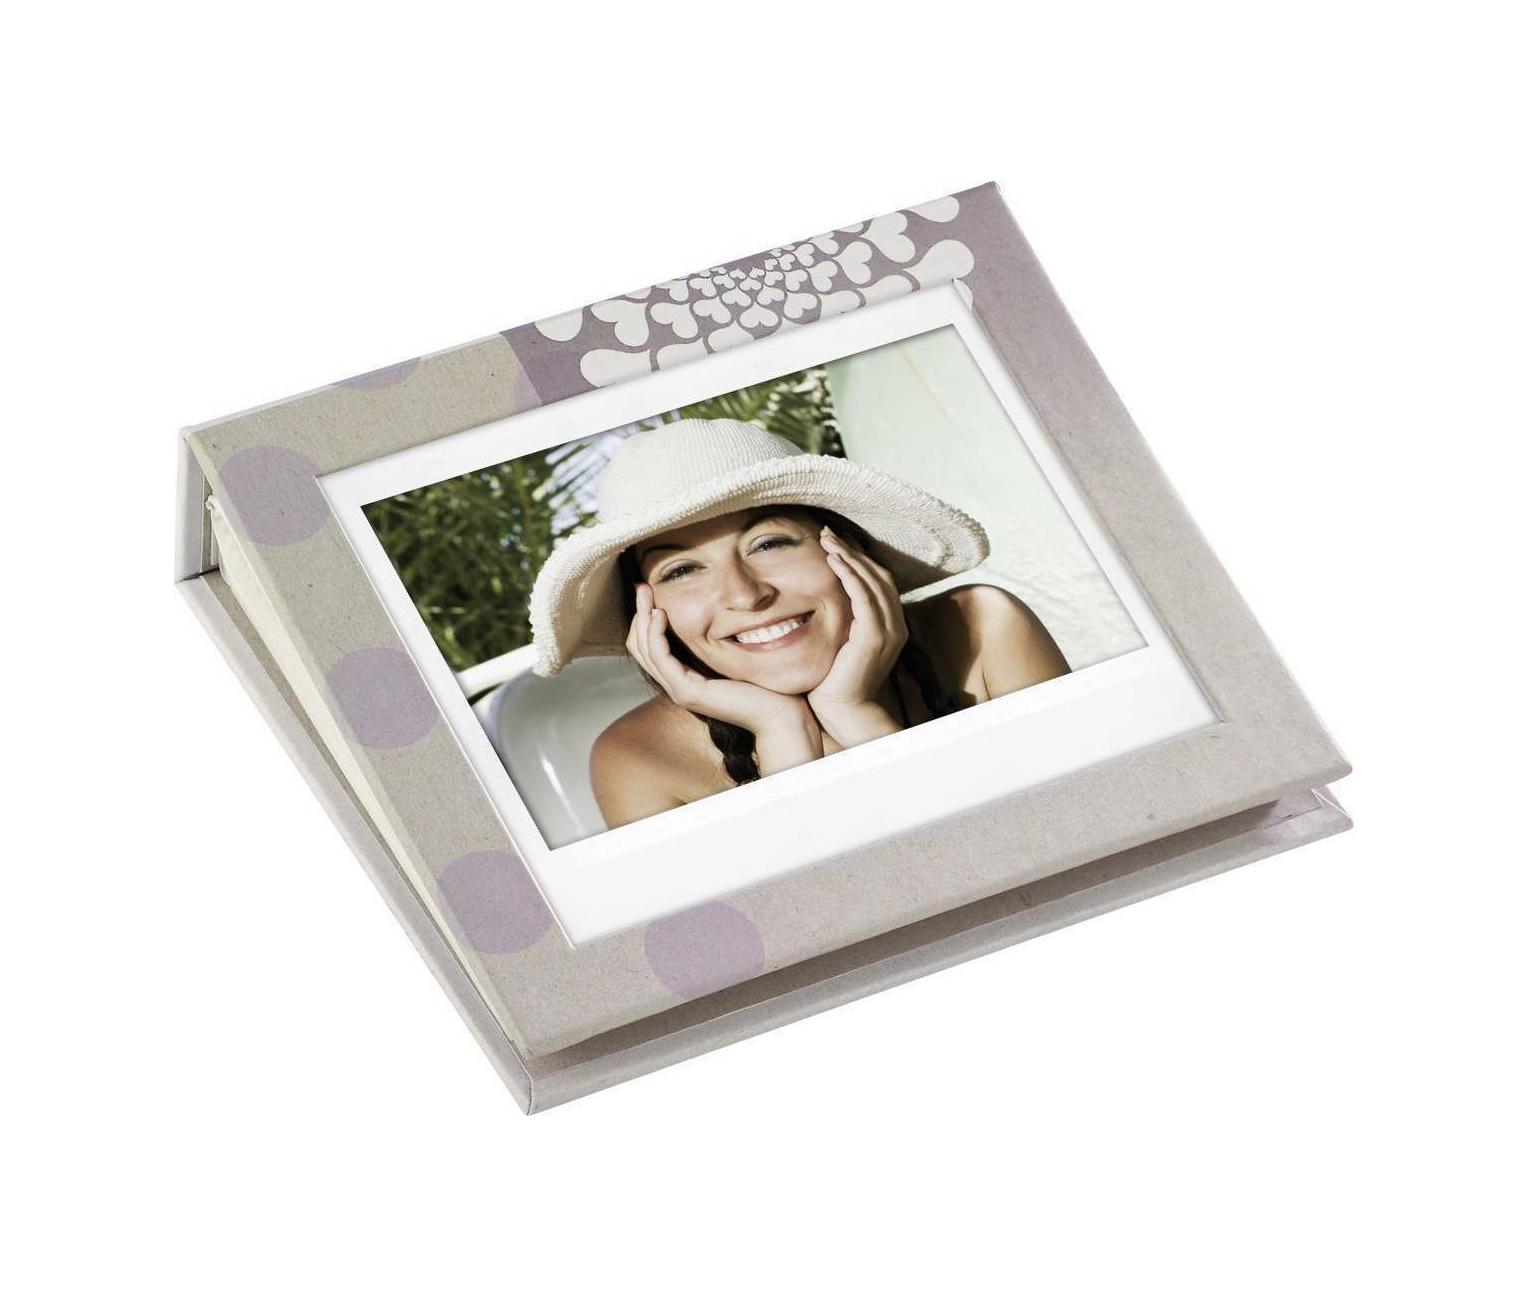 Fujifilm Instax Wide Pocket Album Dots 40 photos 70100133826 Φωτογράφικο Άλμπουμ